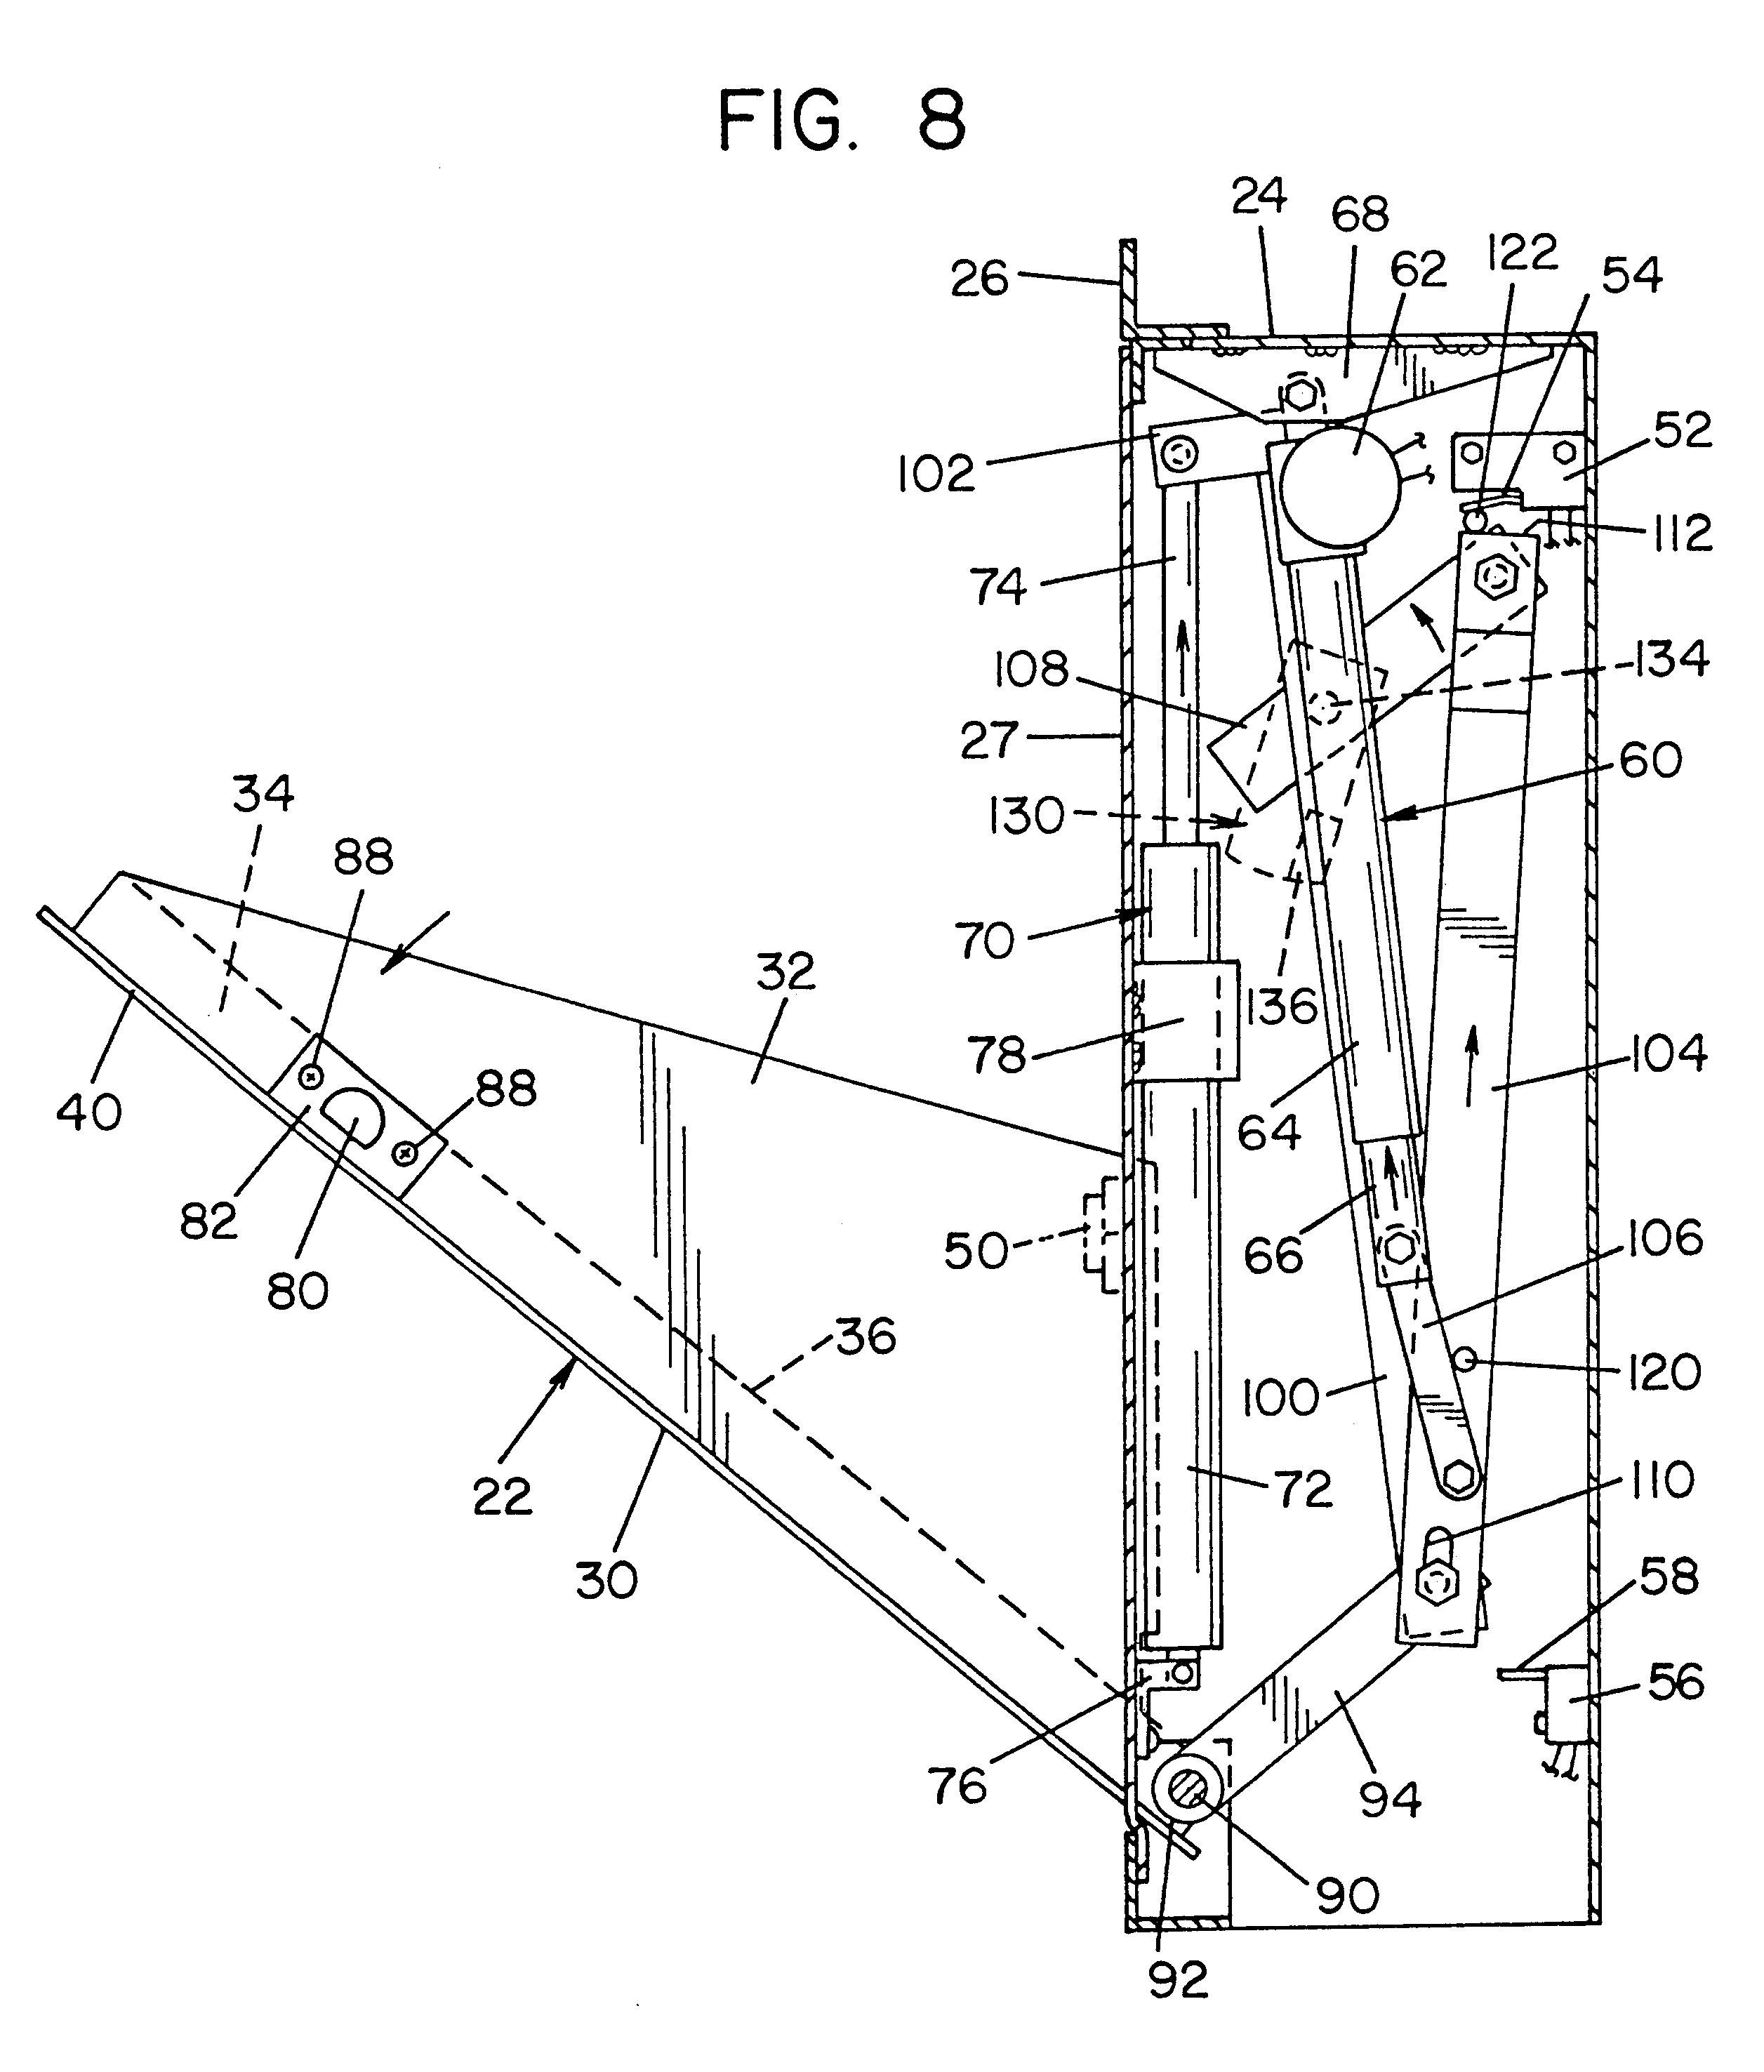 12v dc motor reversing polarity switch wiring diagram